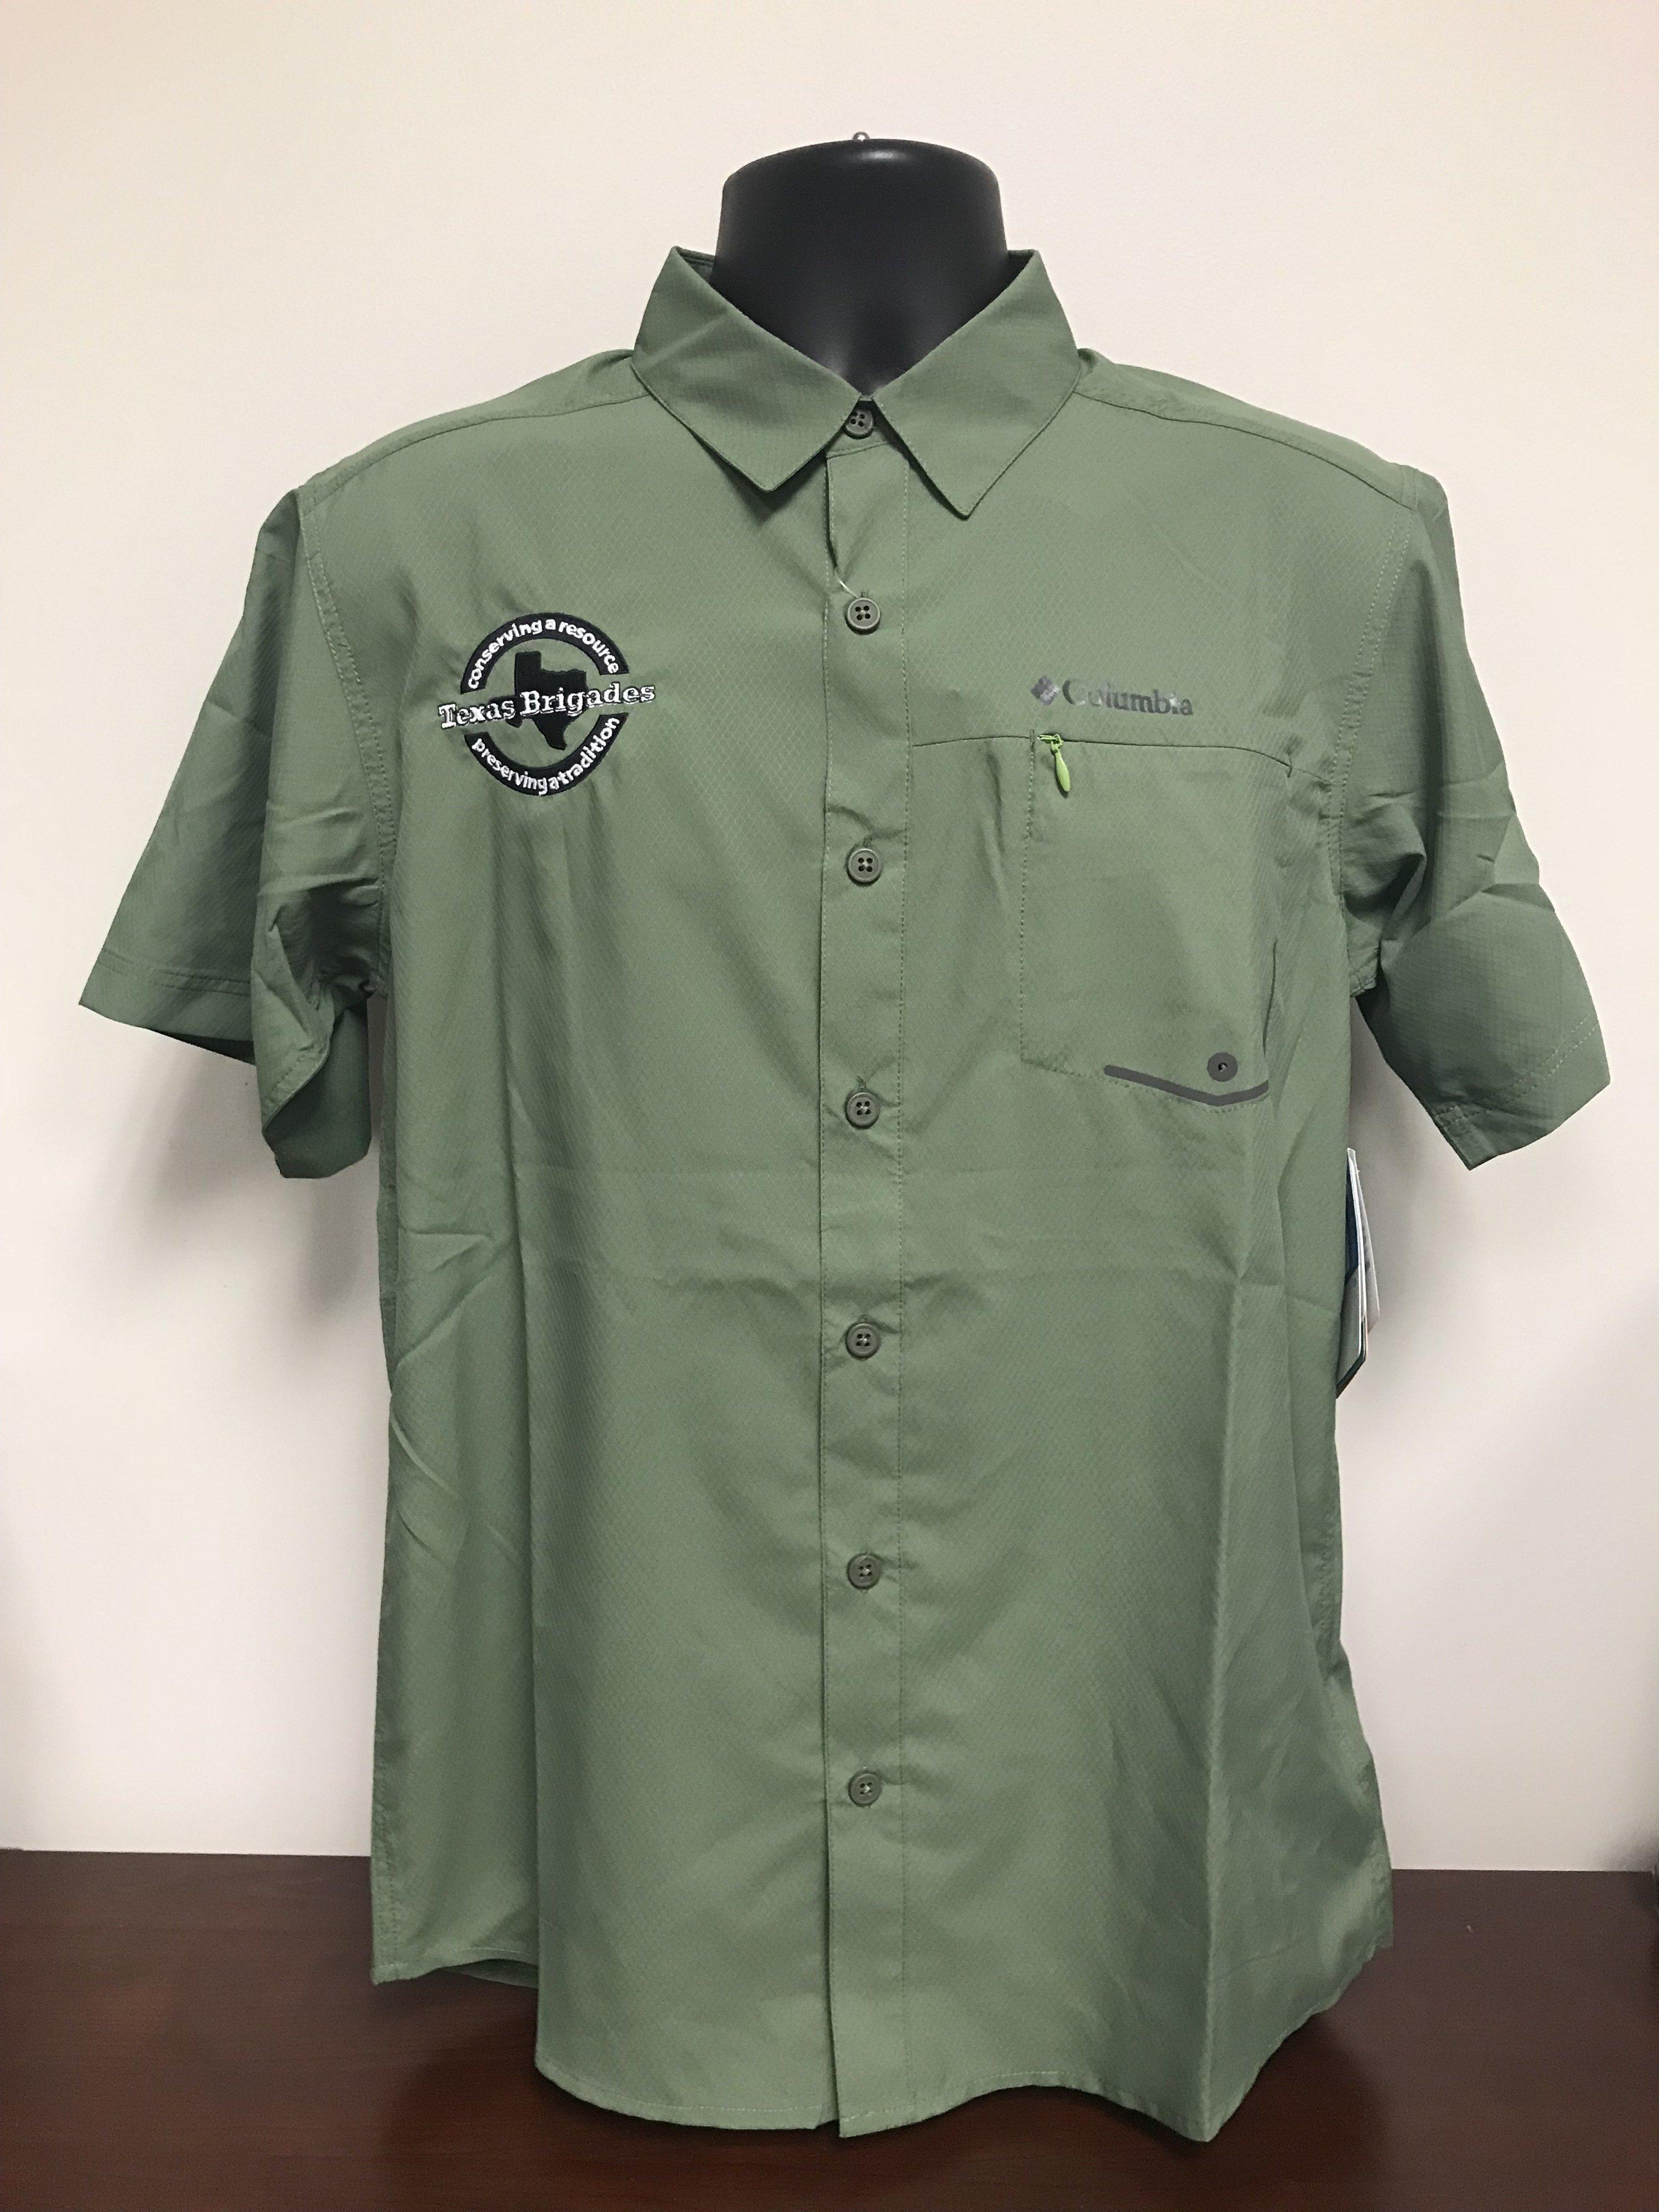 Men's Columbia Short Sleeve Shirt (SMALL) 00010